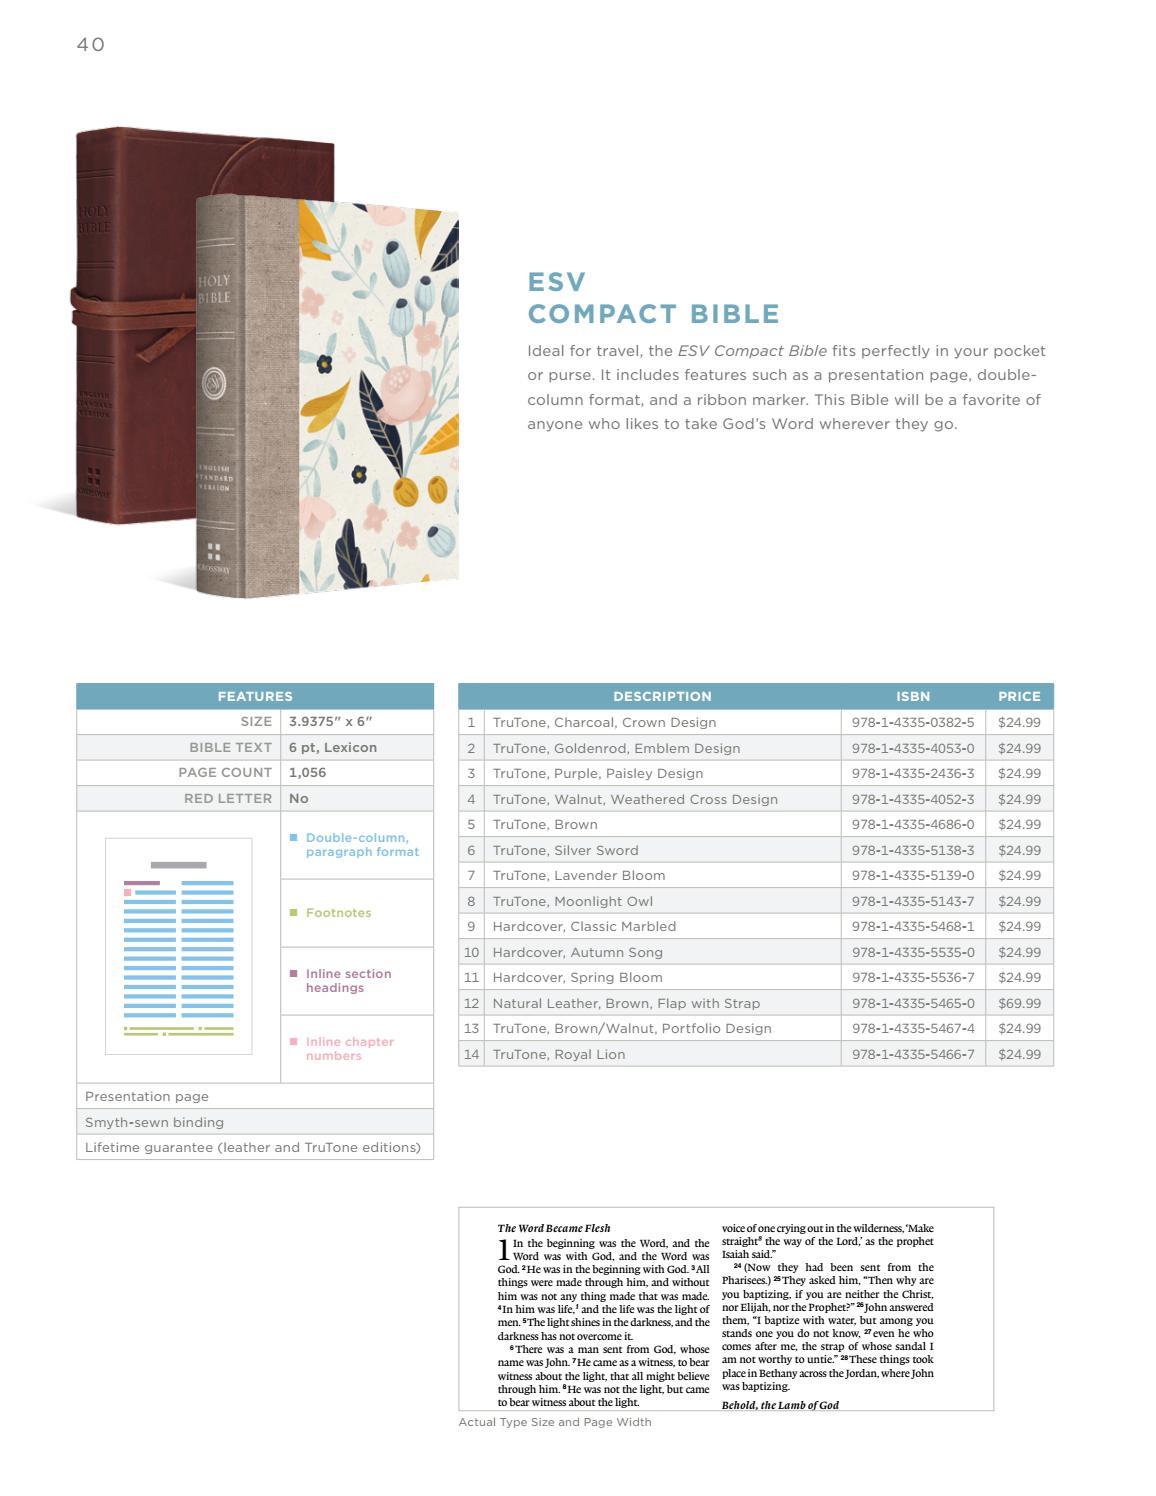 Esv Spring 2017 Bible Catalog By Crossway Issuu